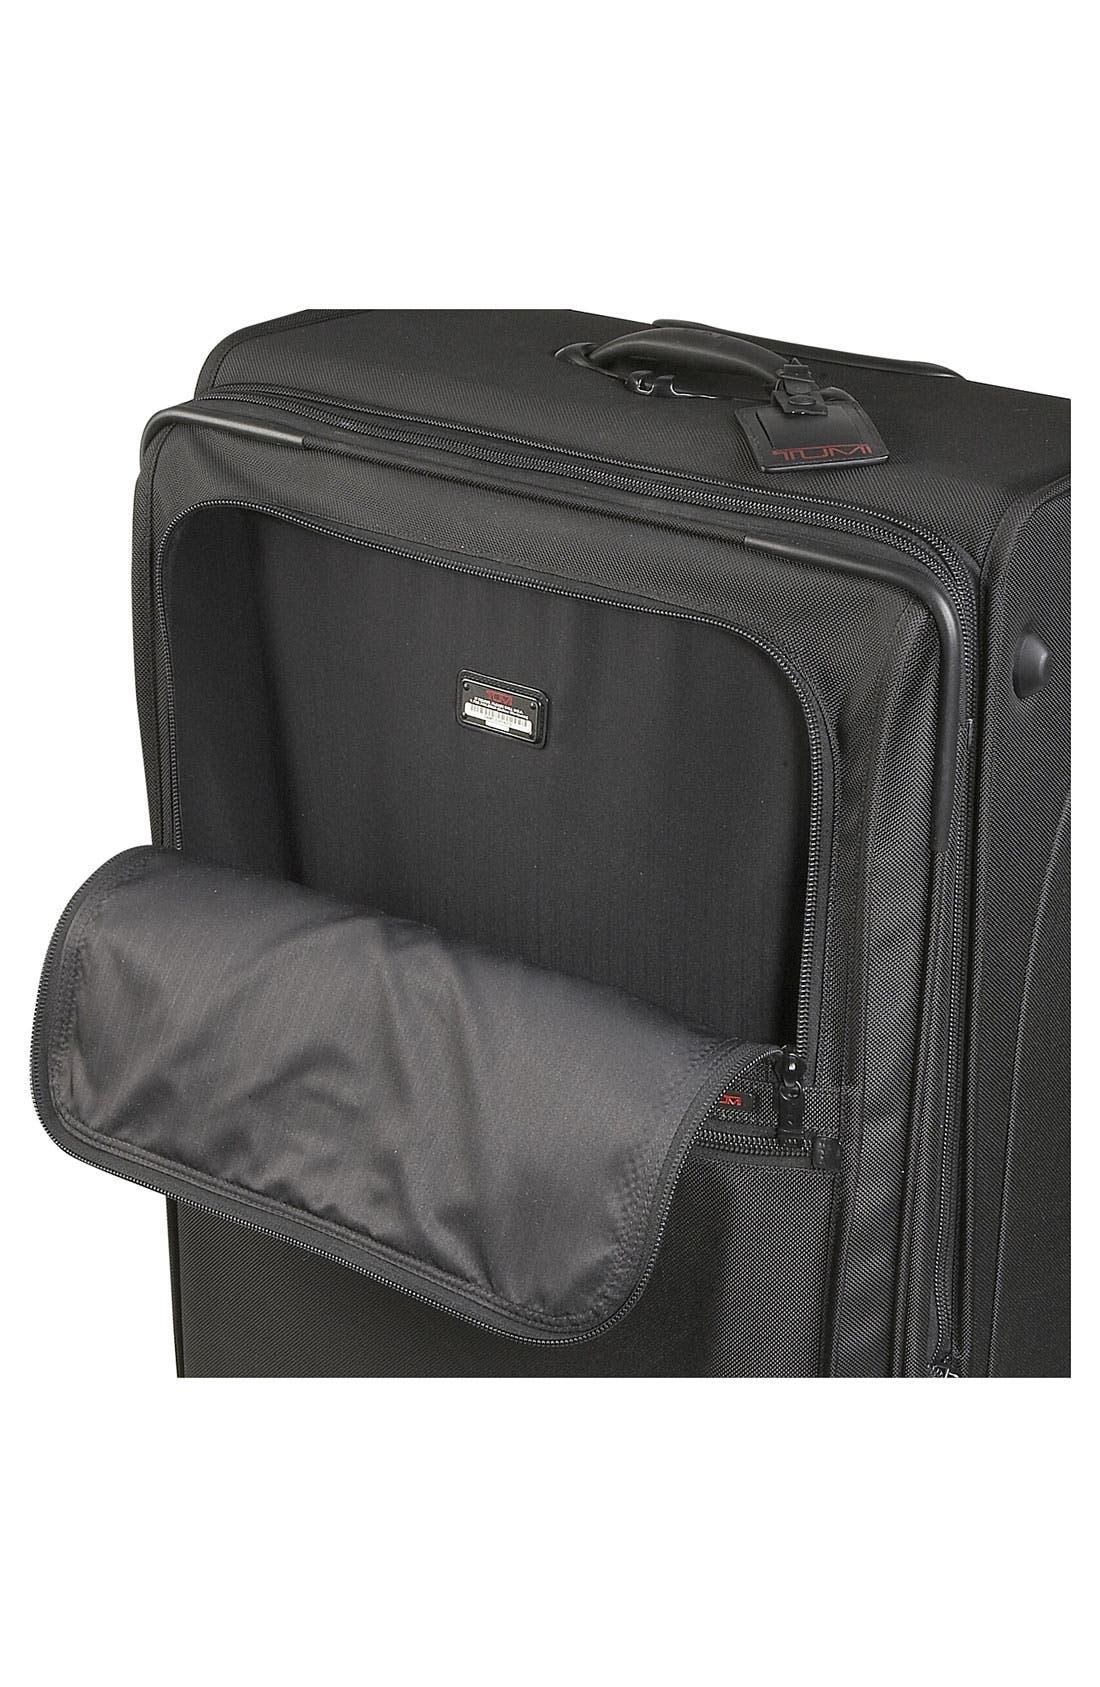 Alternate Image 3  - Tumi 'Alpha' Wheeled Expandable Woldwide Trip Bag